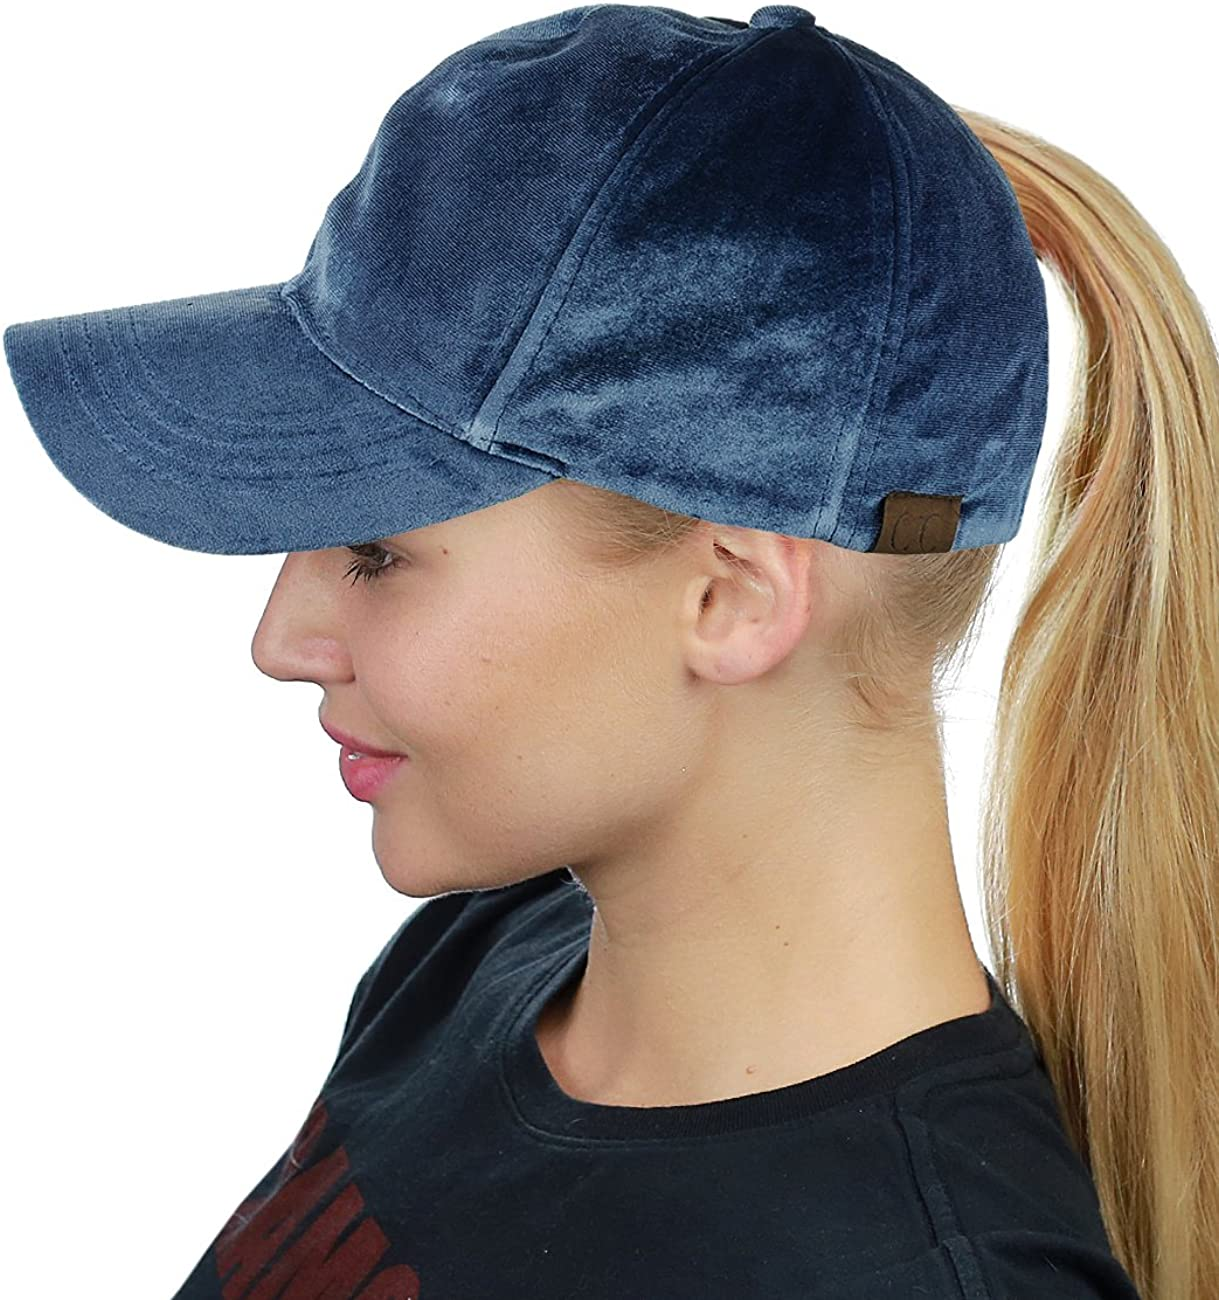 C.C Ponycap Messy High Bun Ponytail Soft Velvet Adjustable Baseball Cap Hat